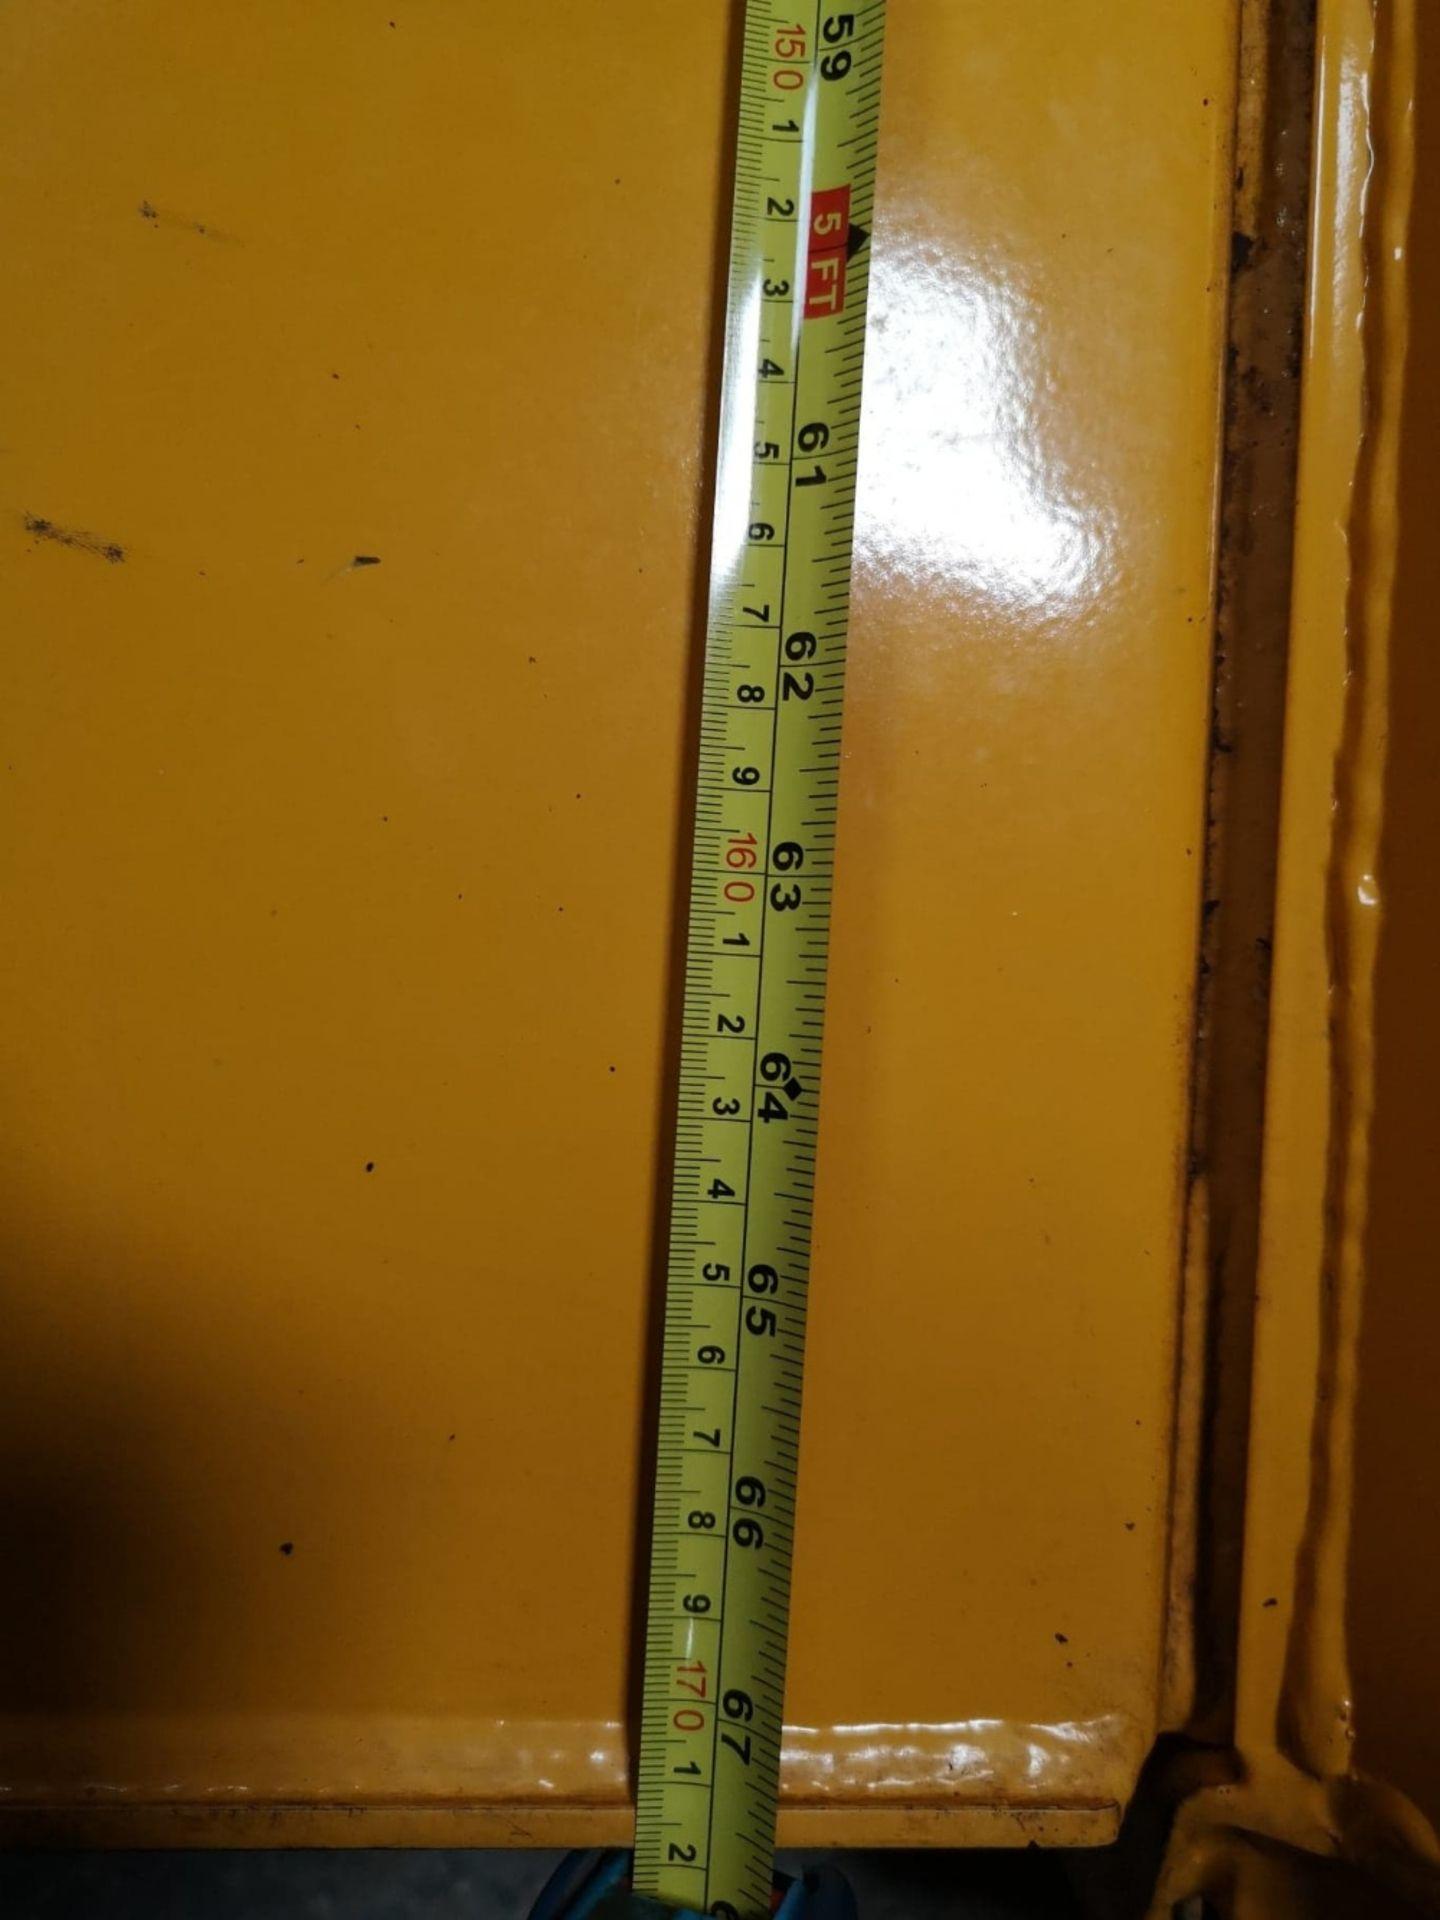 Lot 221 - McCONNEL 1.5M HYREACH SUPERIOR 550 HEDGECUTTER C/W JOYSTICK CONTROL